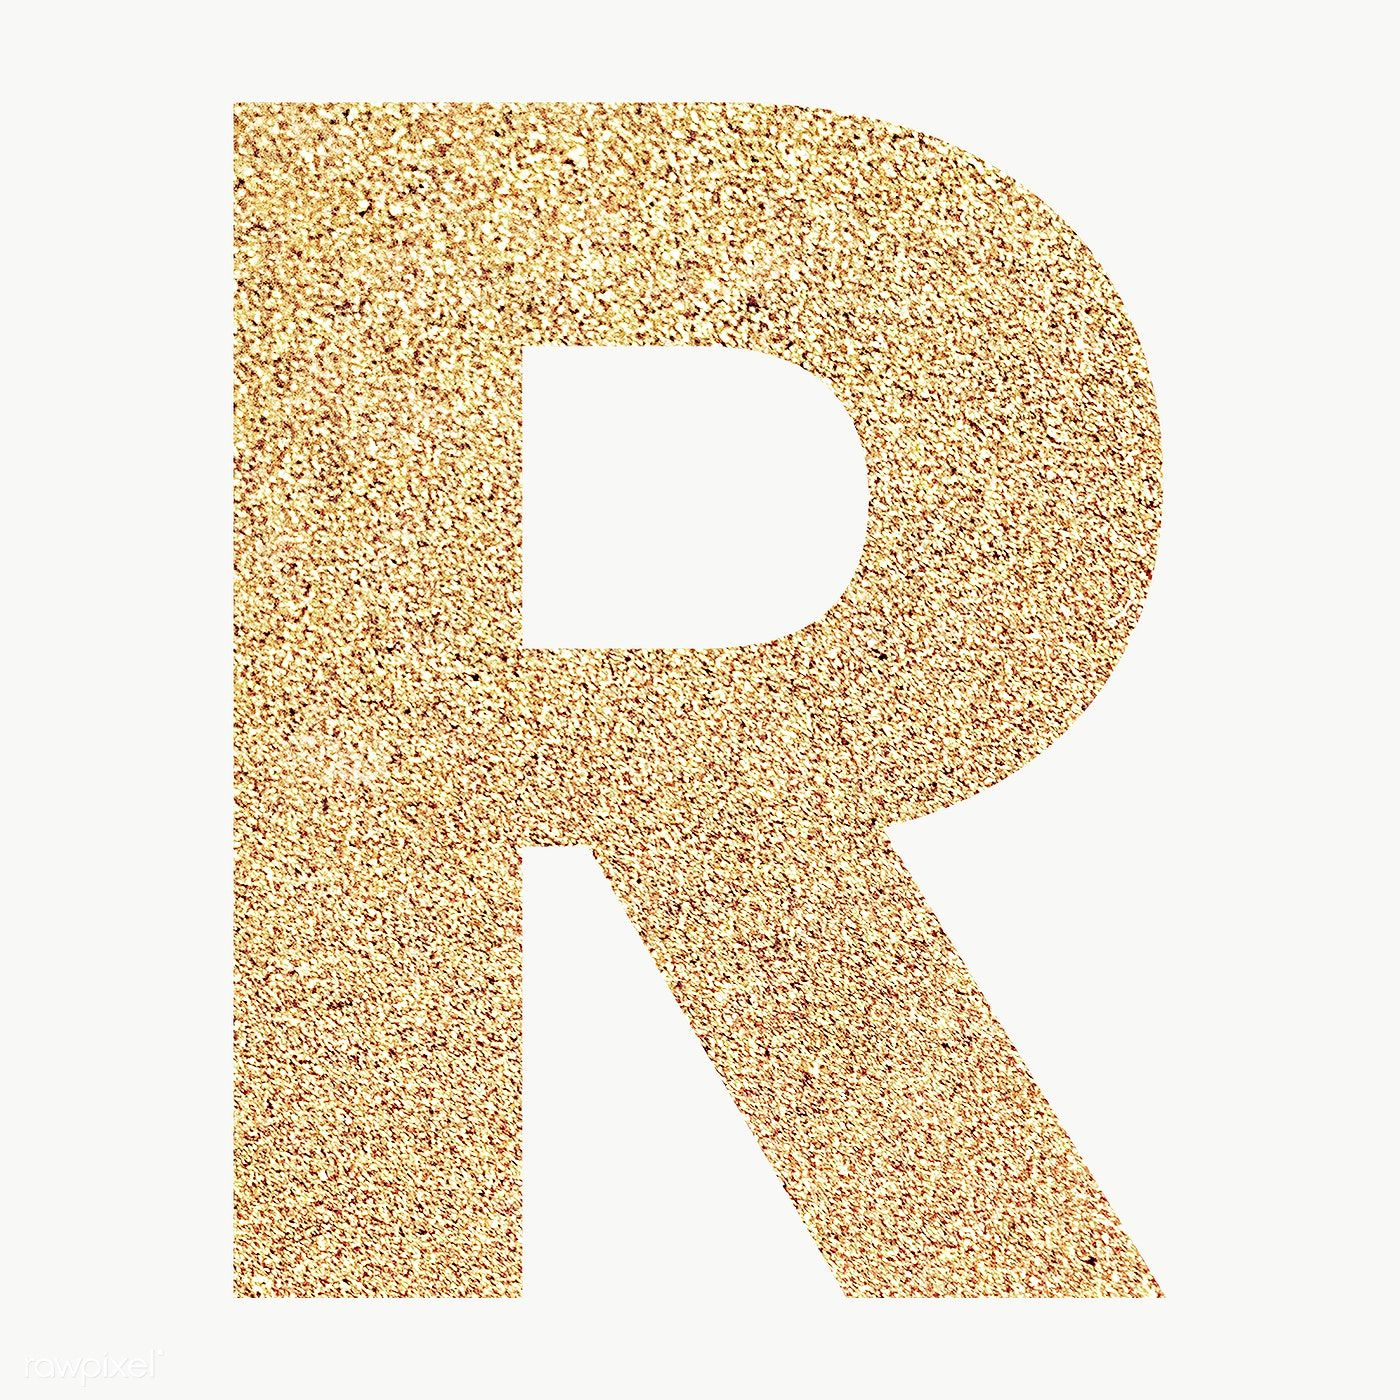 Glitter Capital Letter R Sticker Transparent Png Free Image By Rawpixel Com Ningzk V Transparent Stickers Letter R Glitter Letters